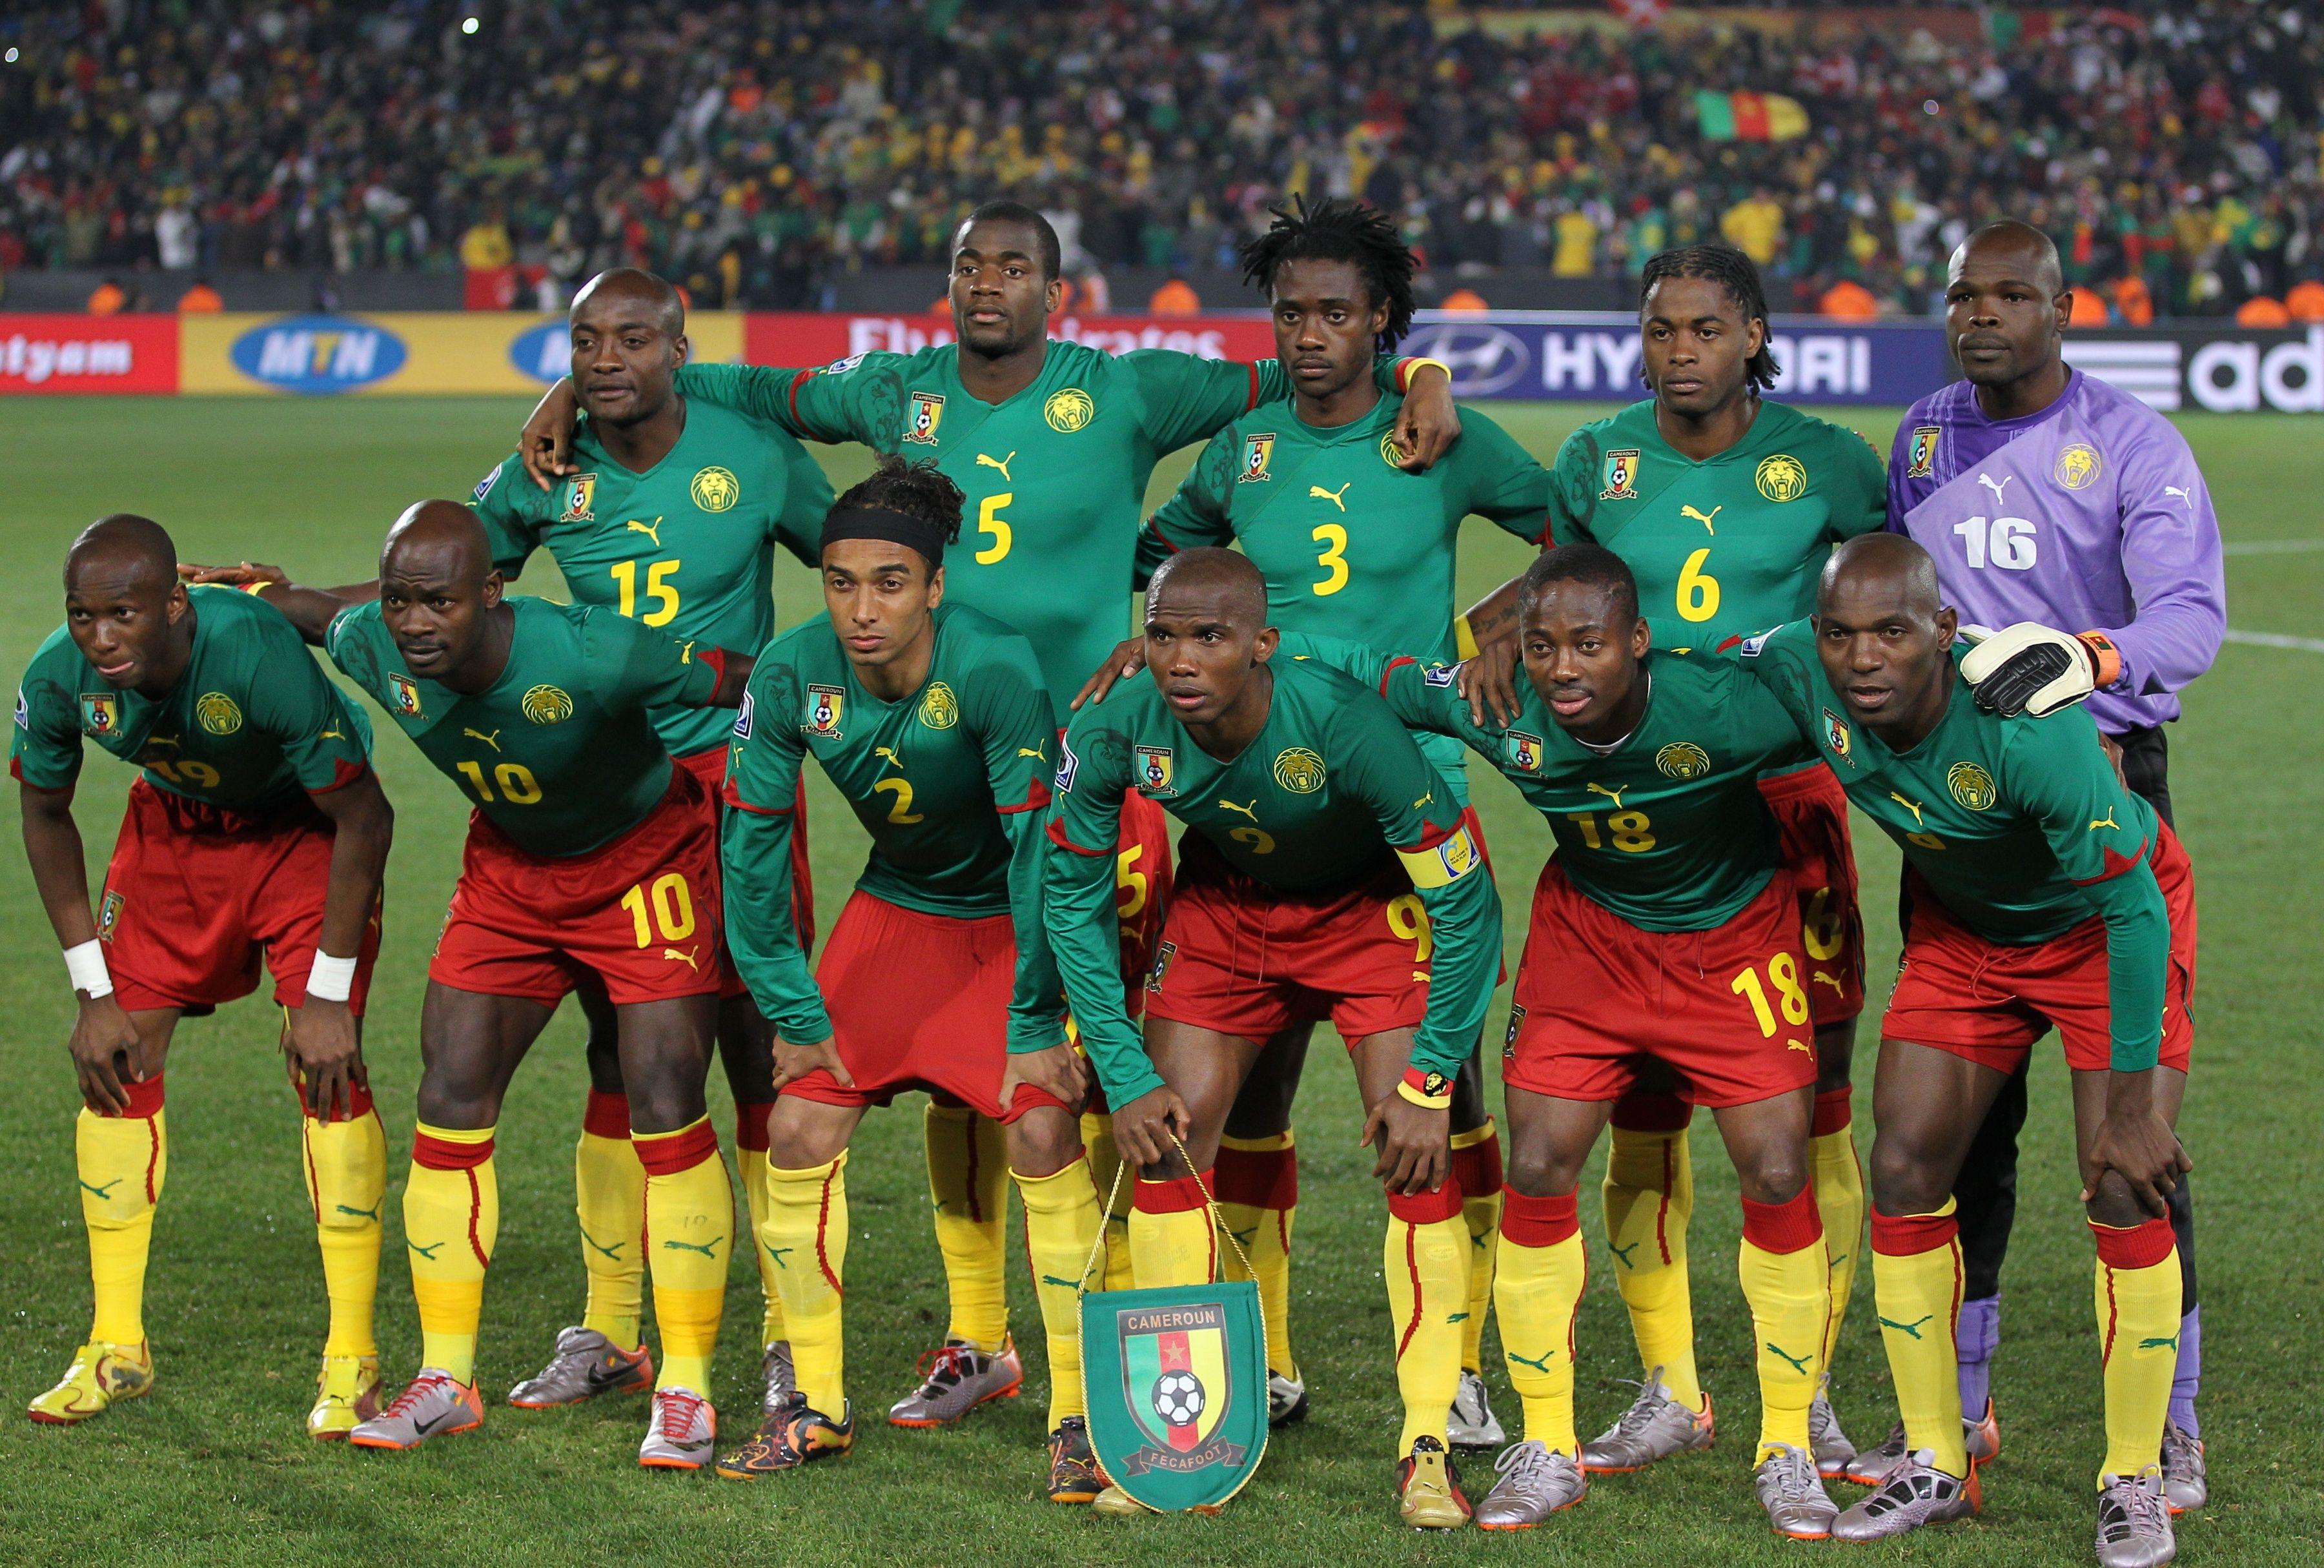 Cameroon Football Team World Cup 2014 World Cup 2014 Team Wallpaper World Cup